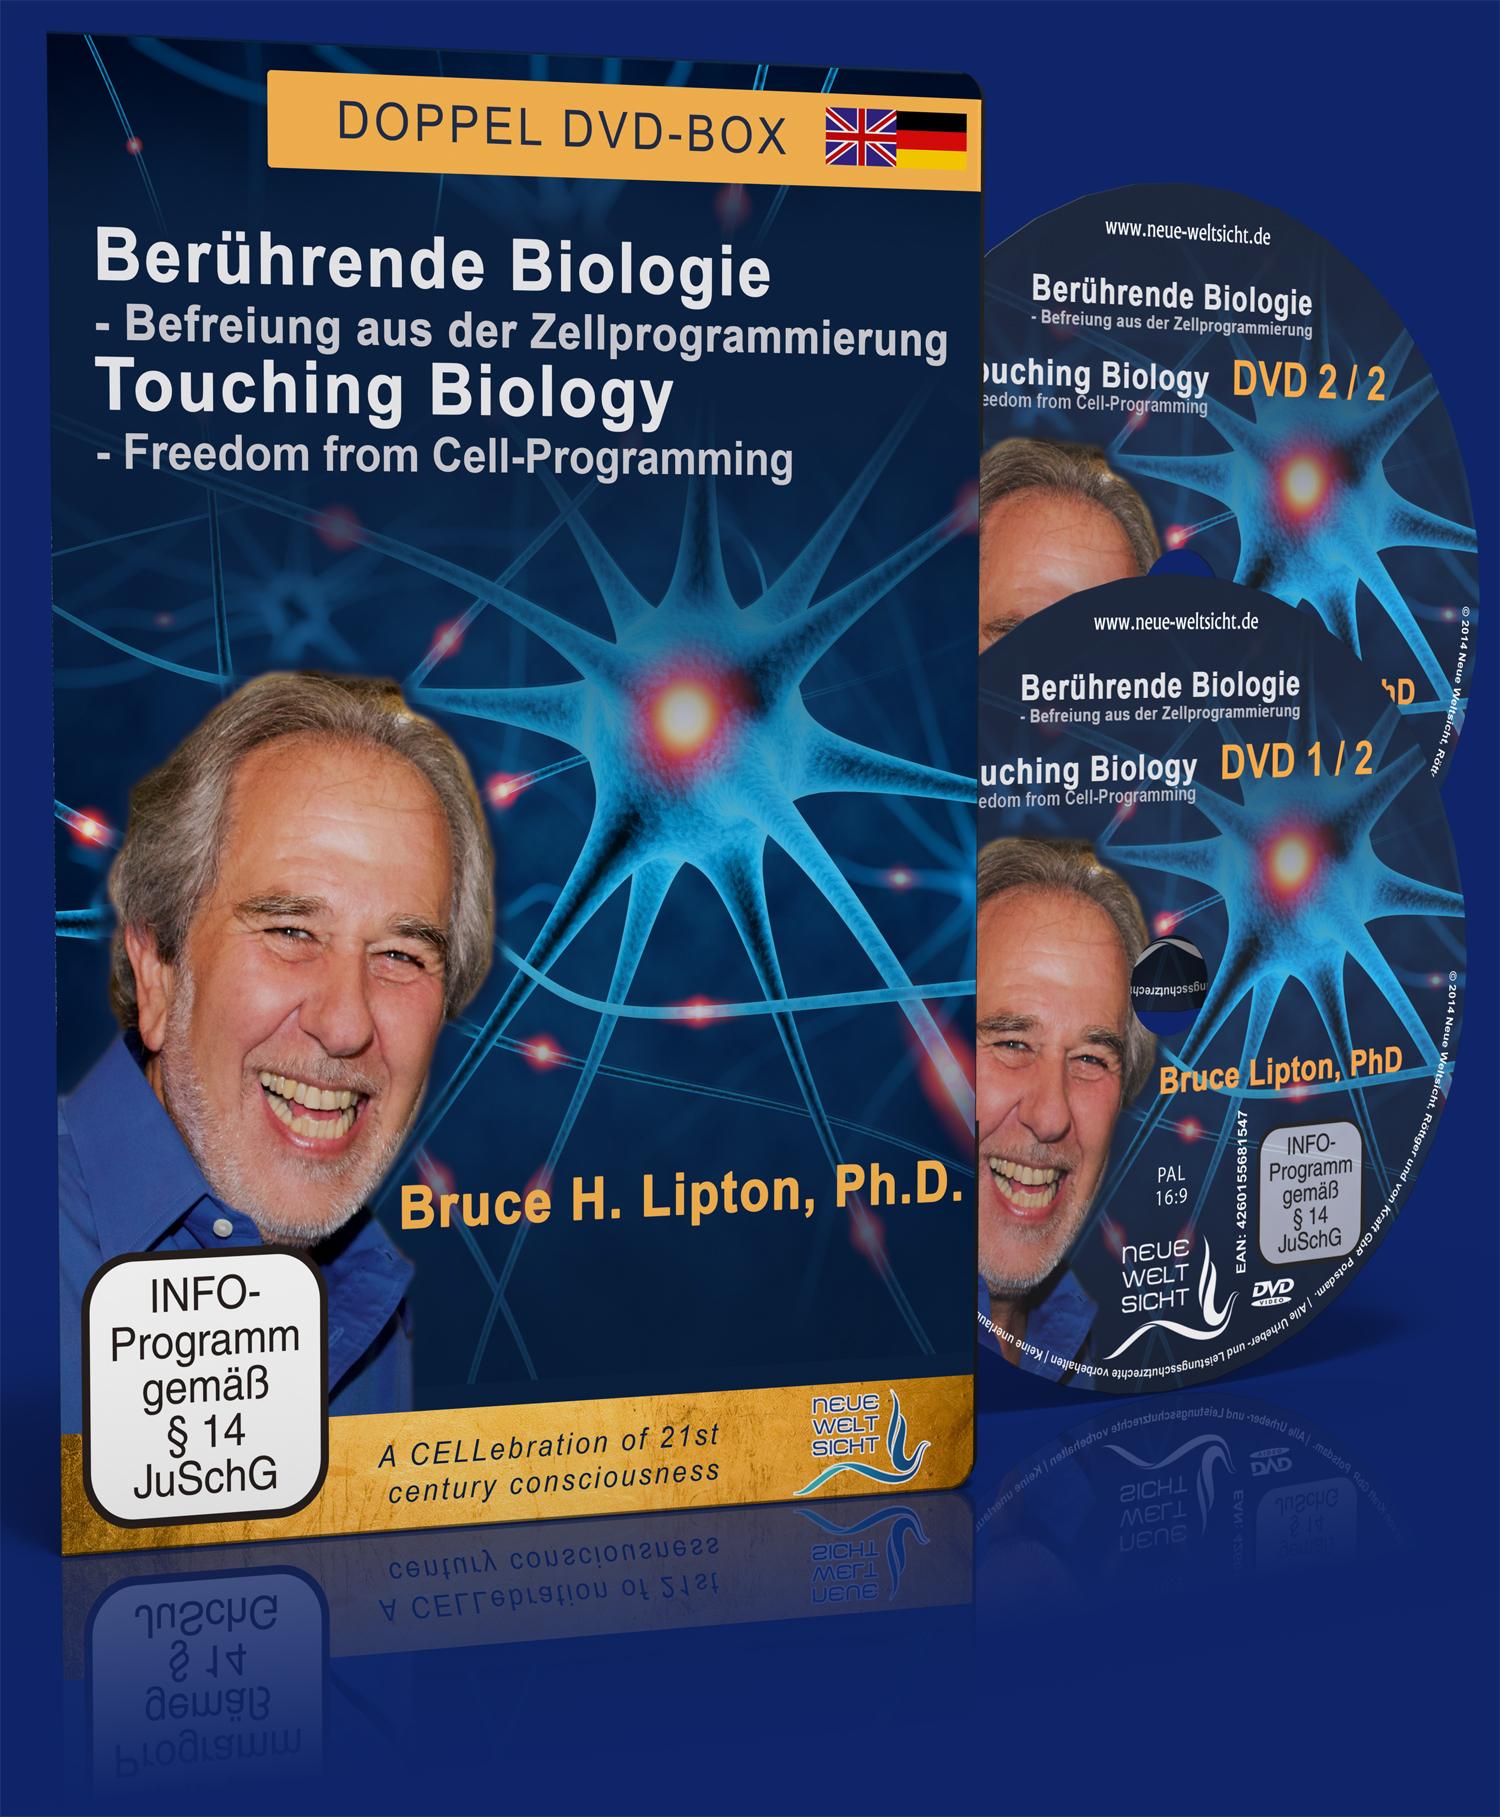 Berührende Biologie - Bruce Lipton: Befreiung aus der Zellprogrammierung  (Doppel-DVD)